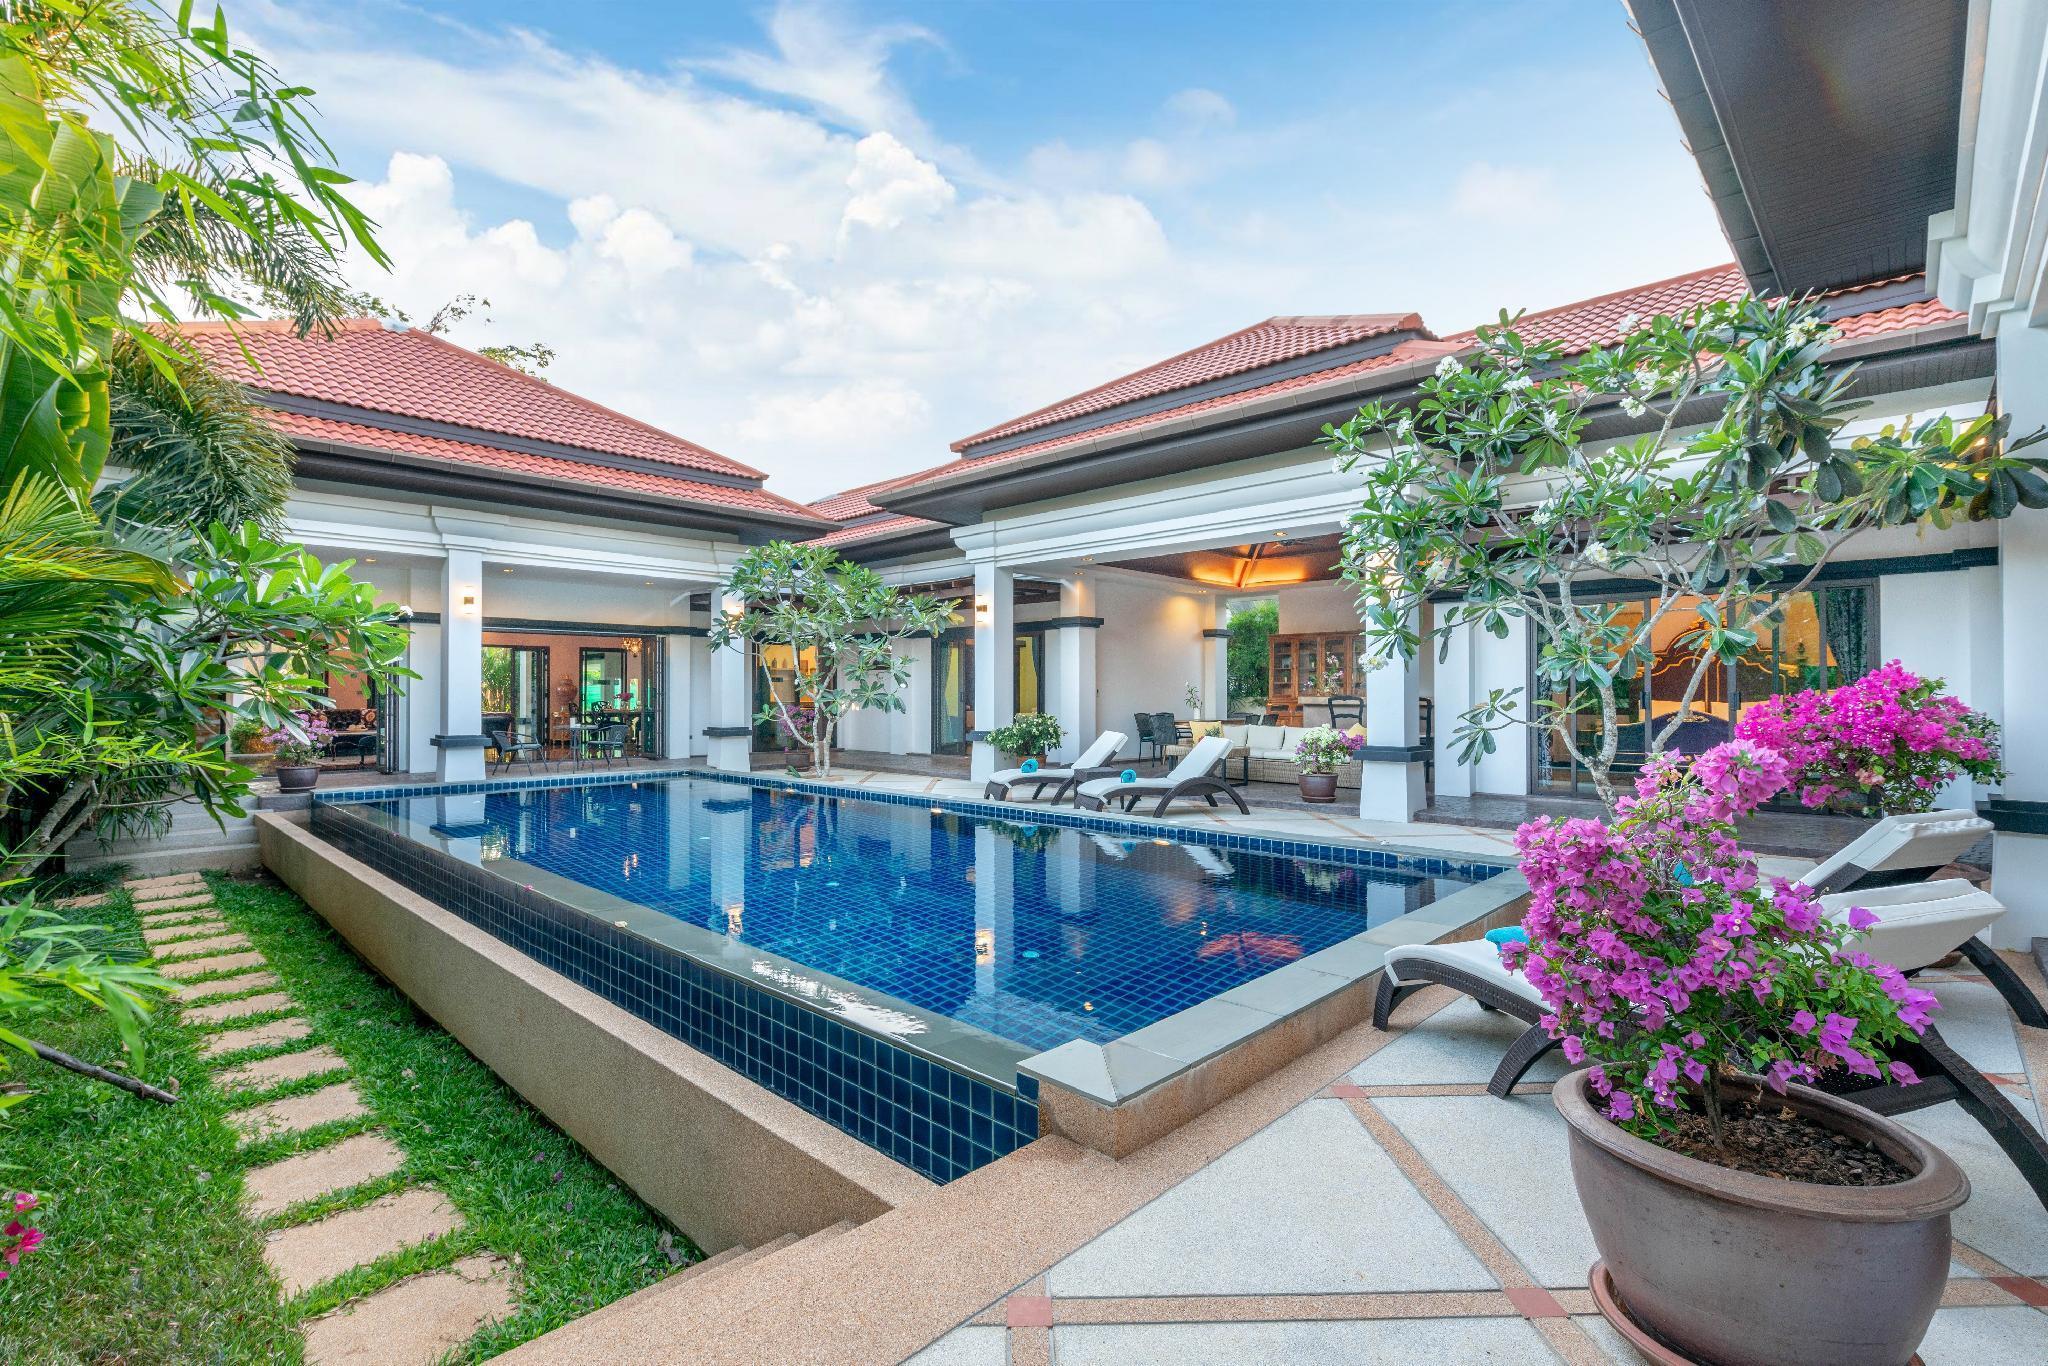 Luxury Private Pool Villa Frangipani Phuket วิลลา 4 ห้องนอน 4 ห้องน้ำส่วนตัว ขนาด 540 ตร.ม. – บางเทา